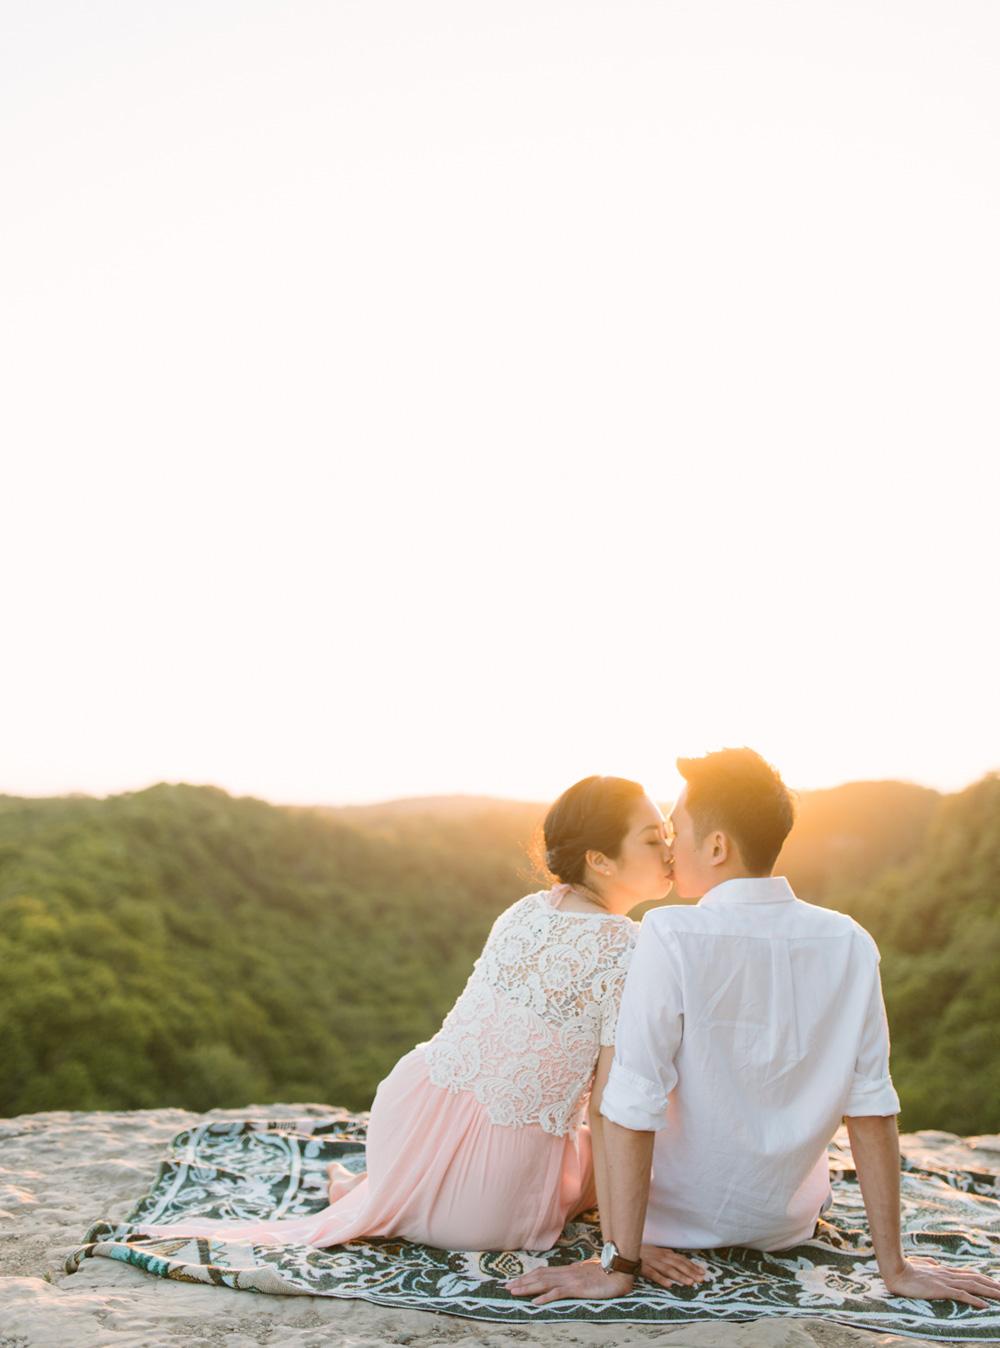 melissa-sung-photography-hamilton-coffeeshop-hike-adventure-engagement027.jpg